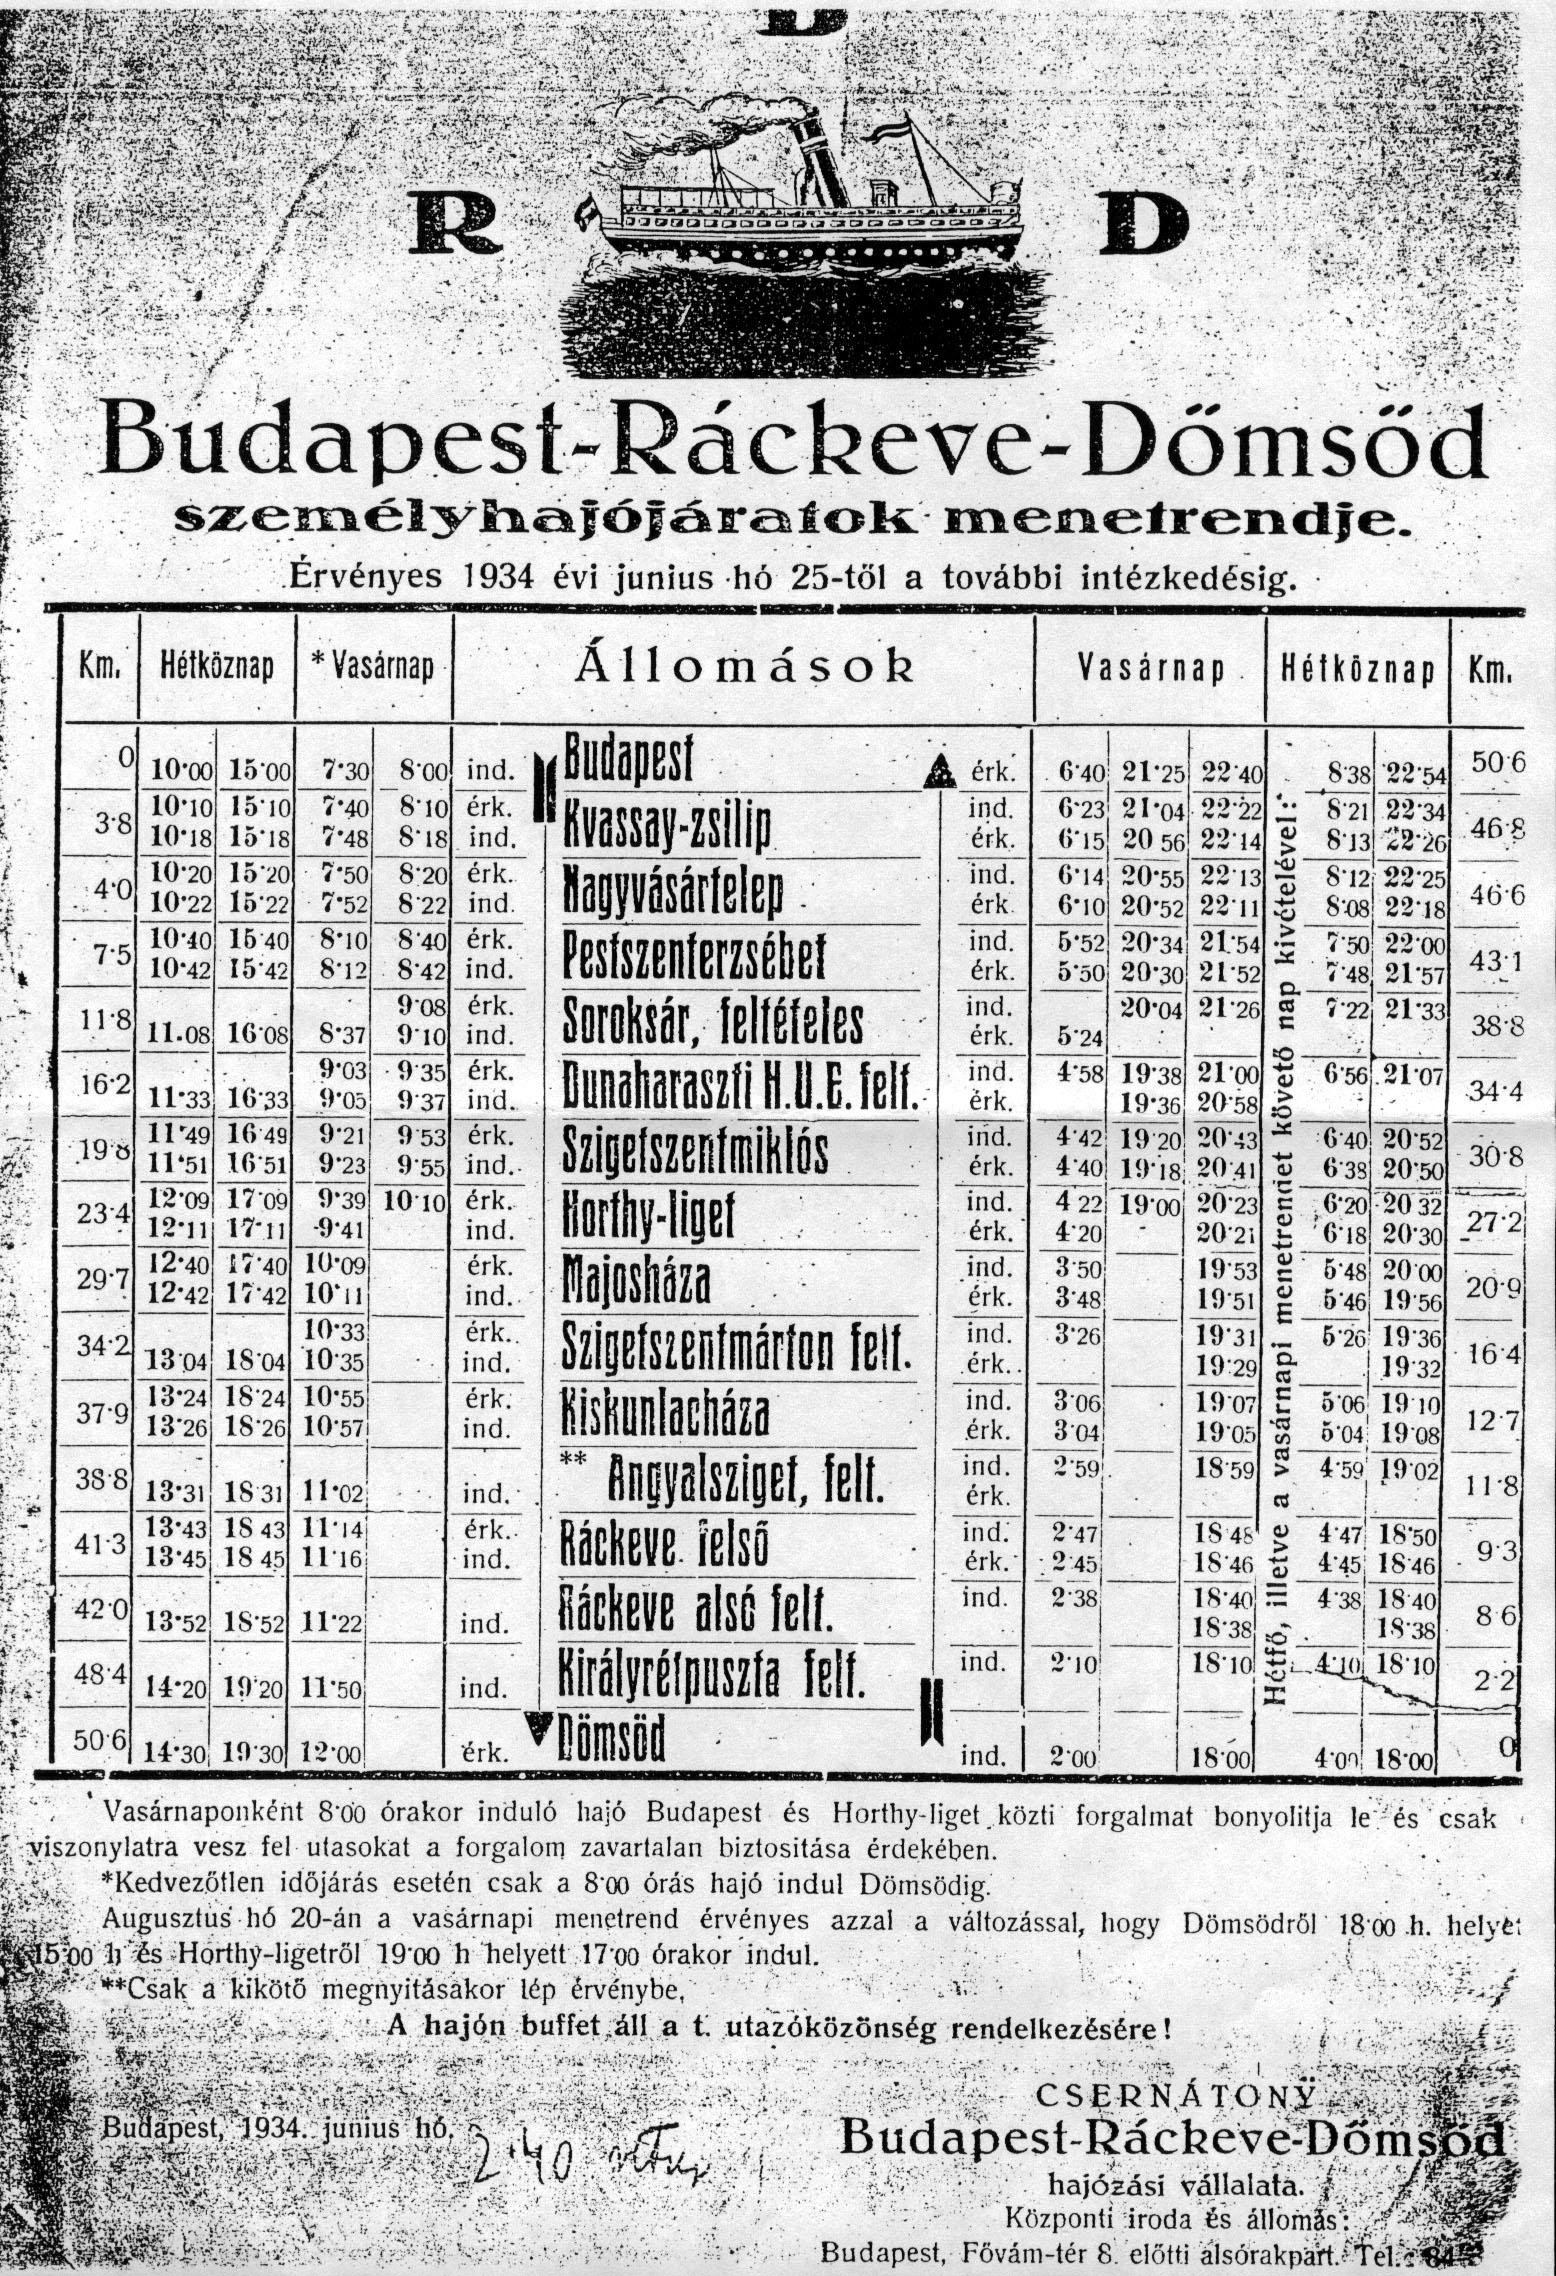 http://www.kisdunainagyhajok.hu/dokumentumok/www_kisdunainagyhajok_hu_brd_vizibusz_menetrend_1934.jpg